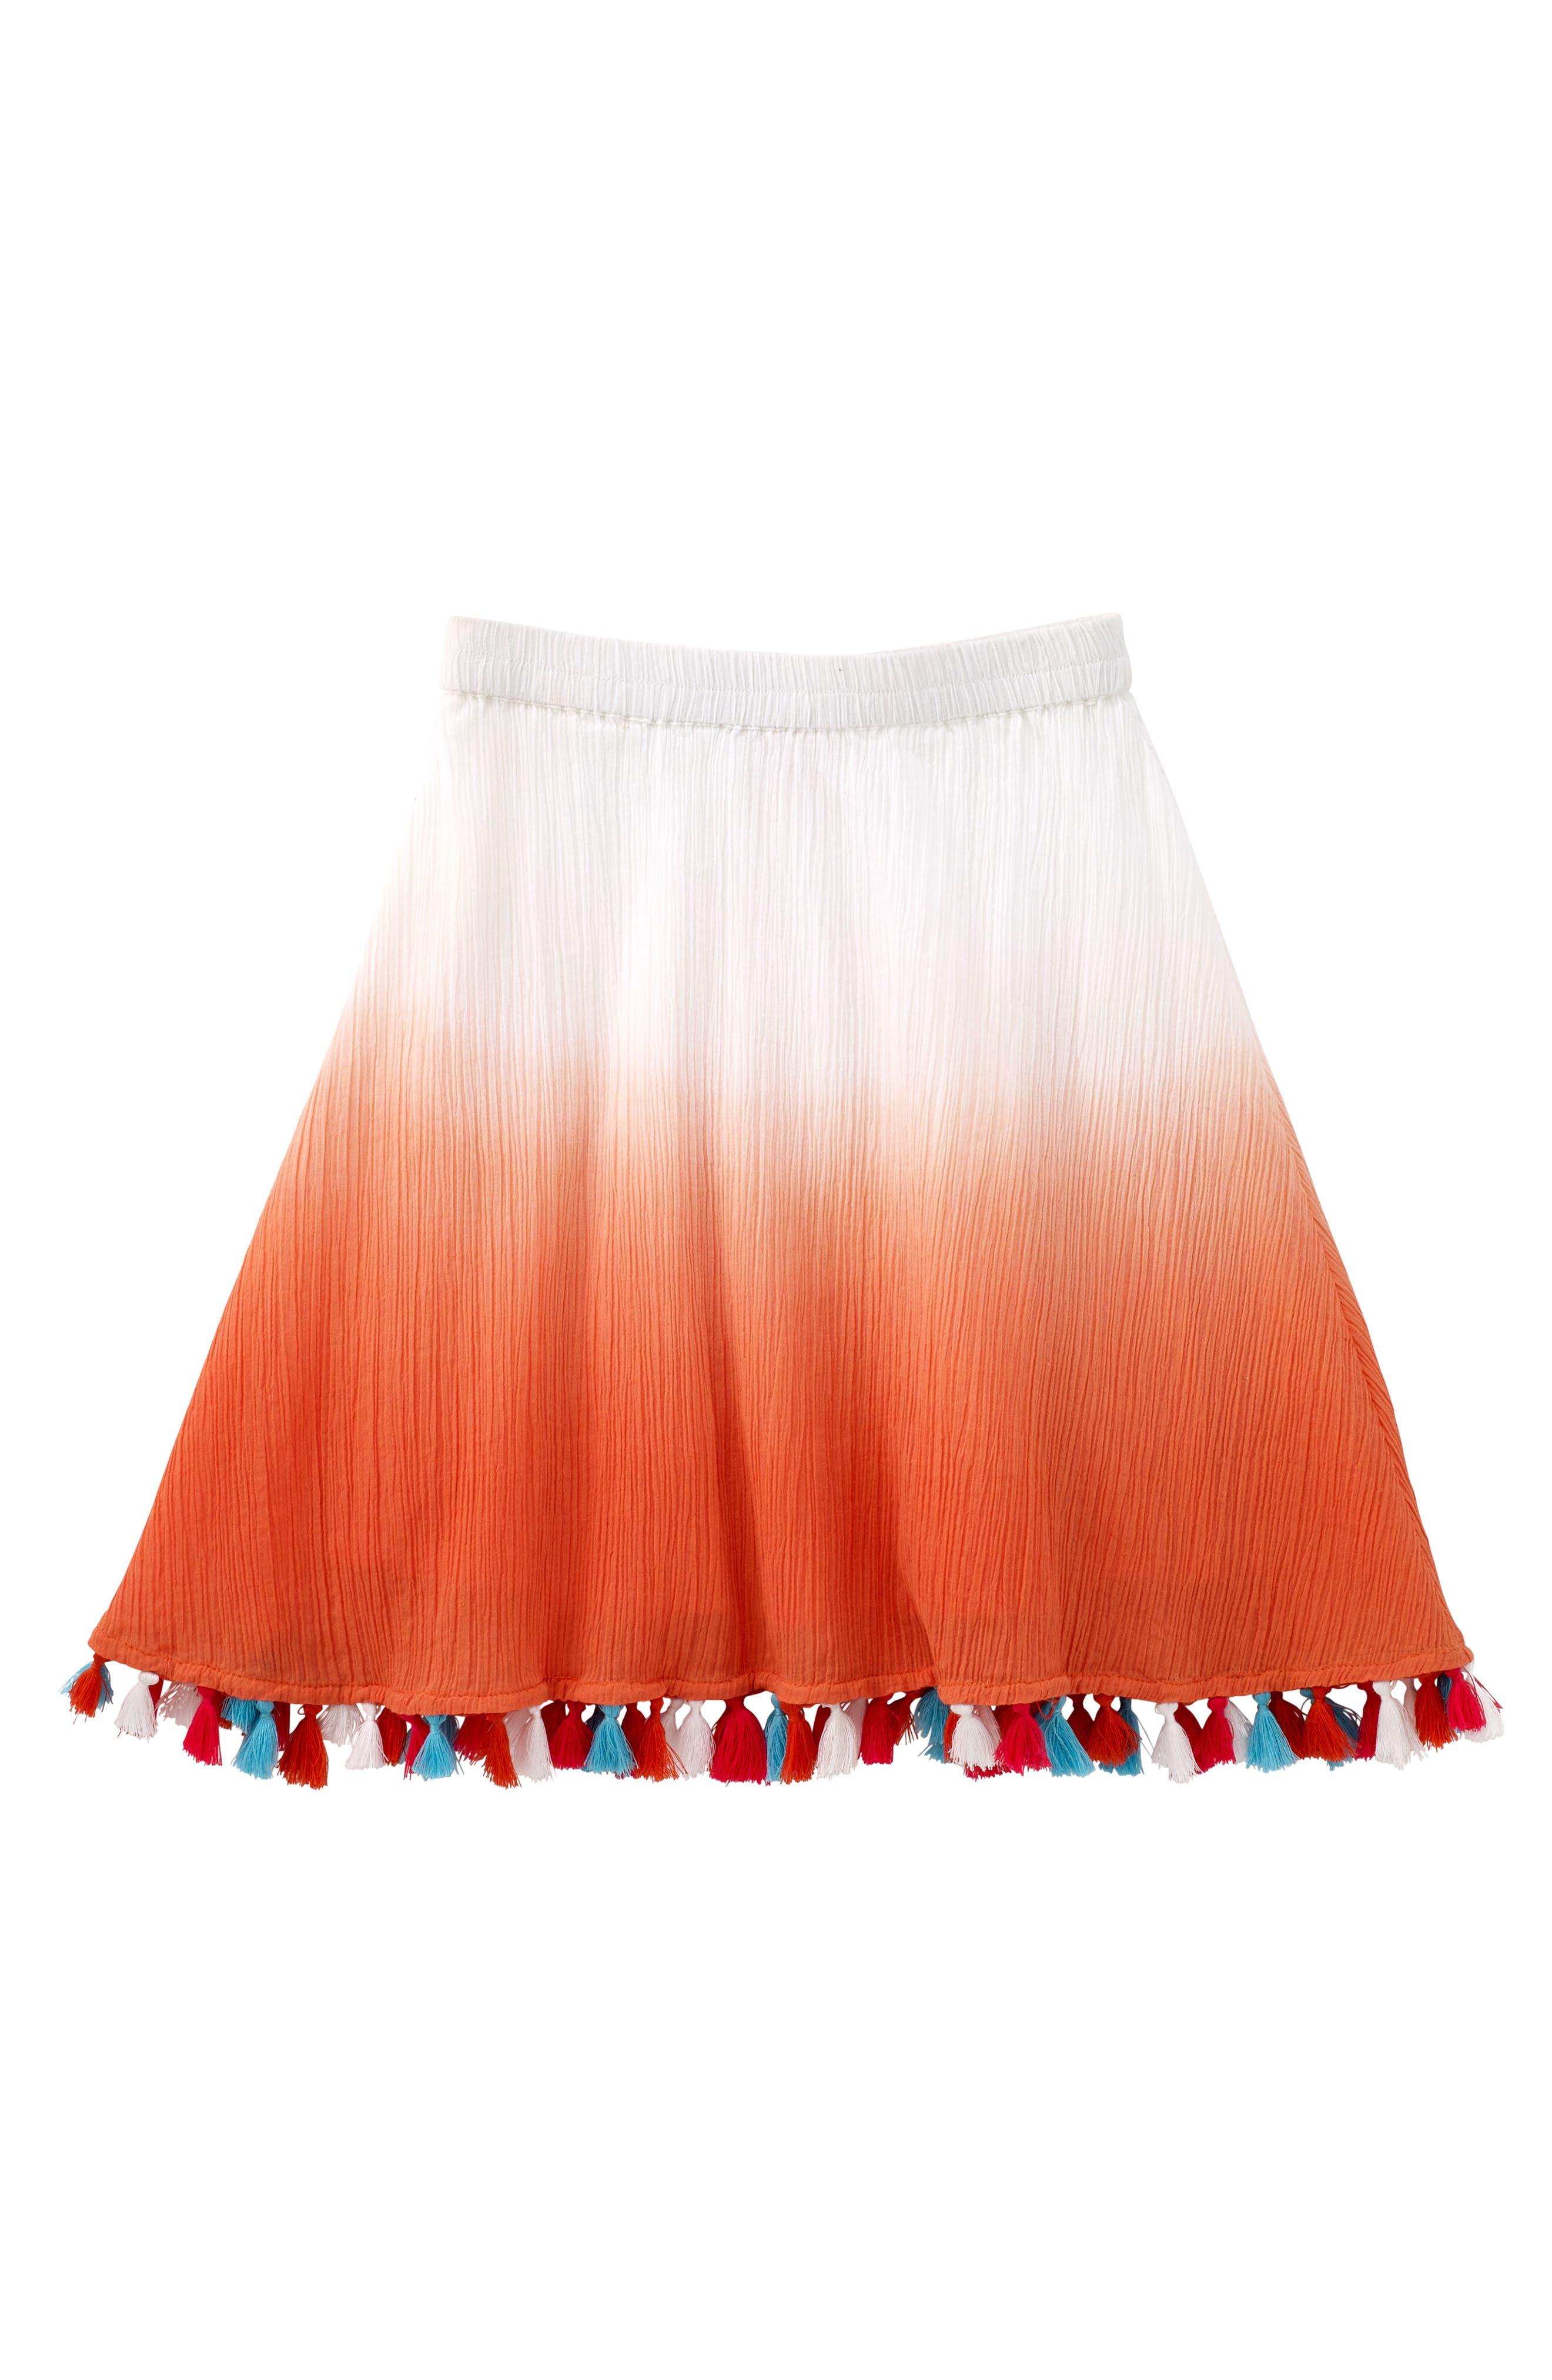 Dip Dye Tassel Skirt,                             Main thumbnail 1, color,                             Coral